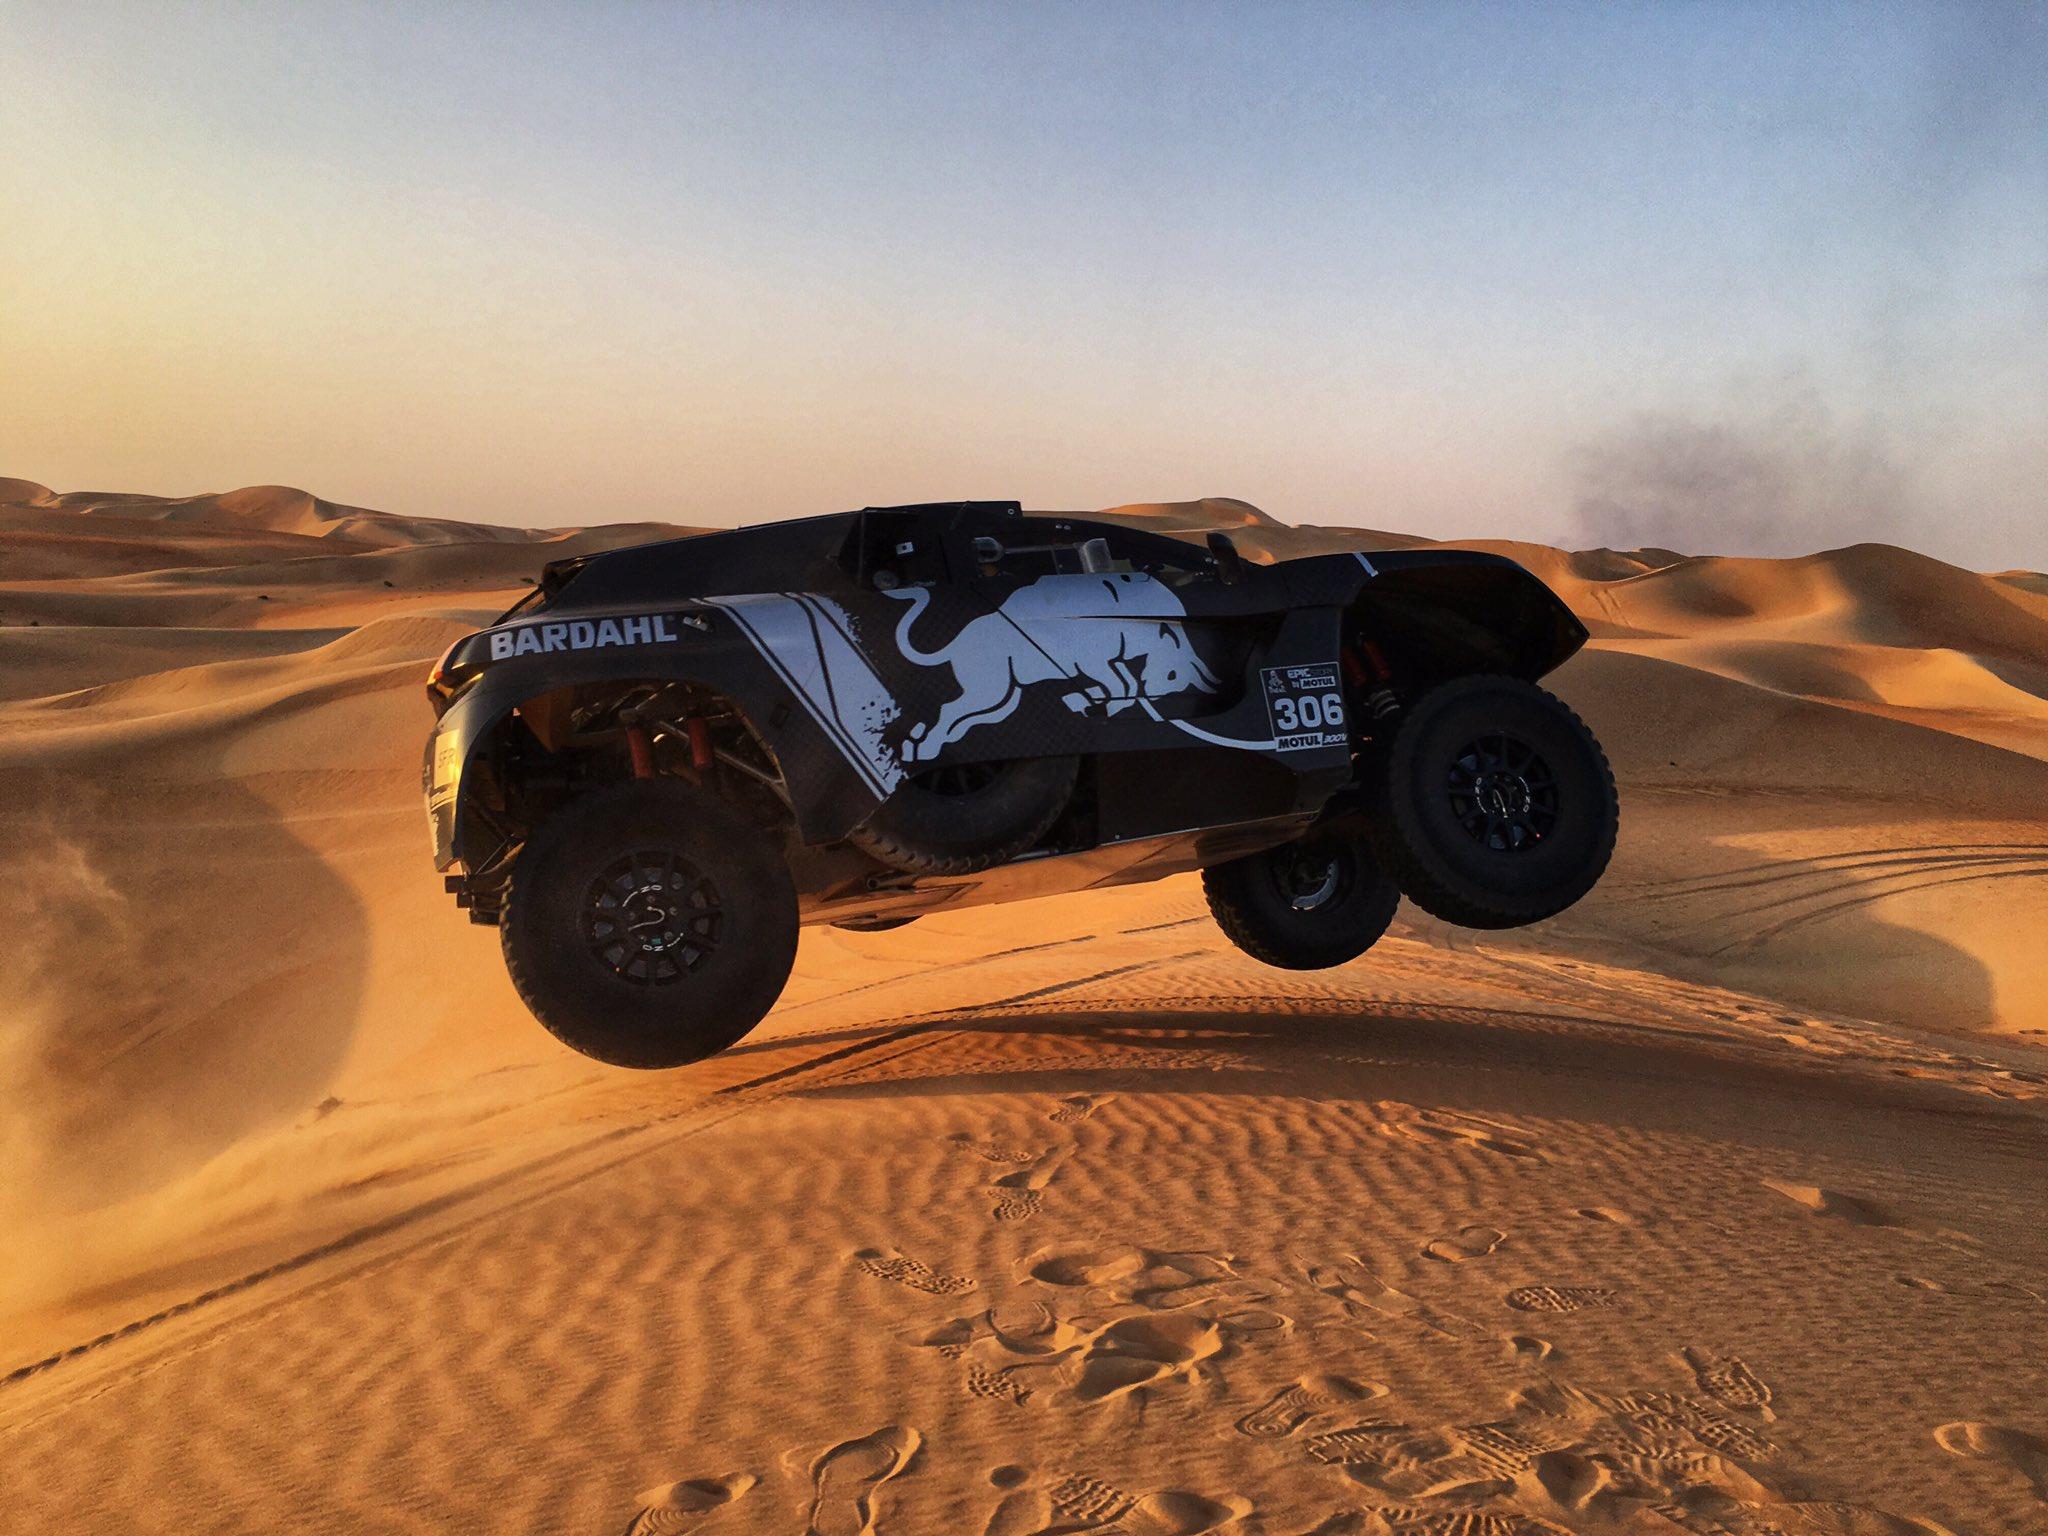 2019 41º Rallye Raid Dakar - Perú [6-17 Enero] - Página 2 DuJfUr1W0AENm_v